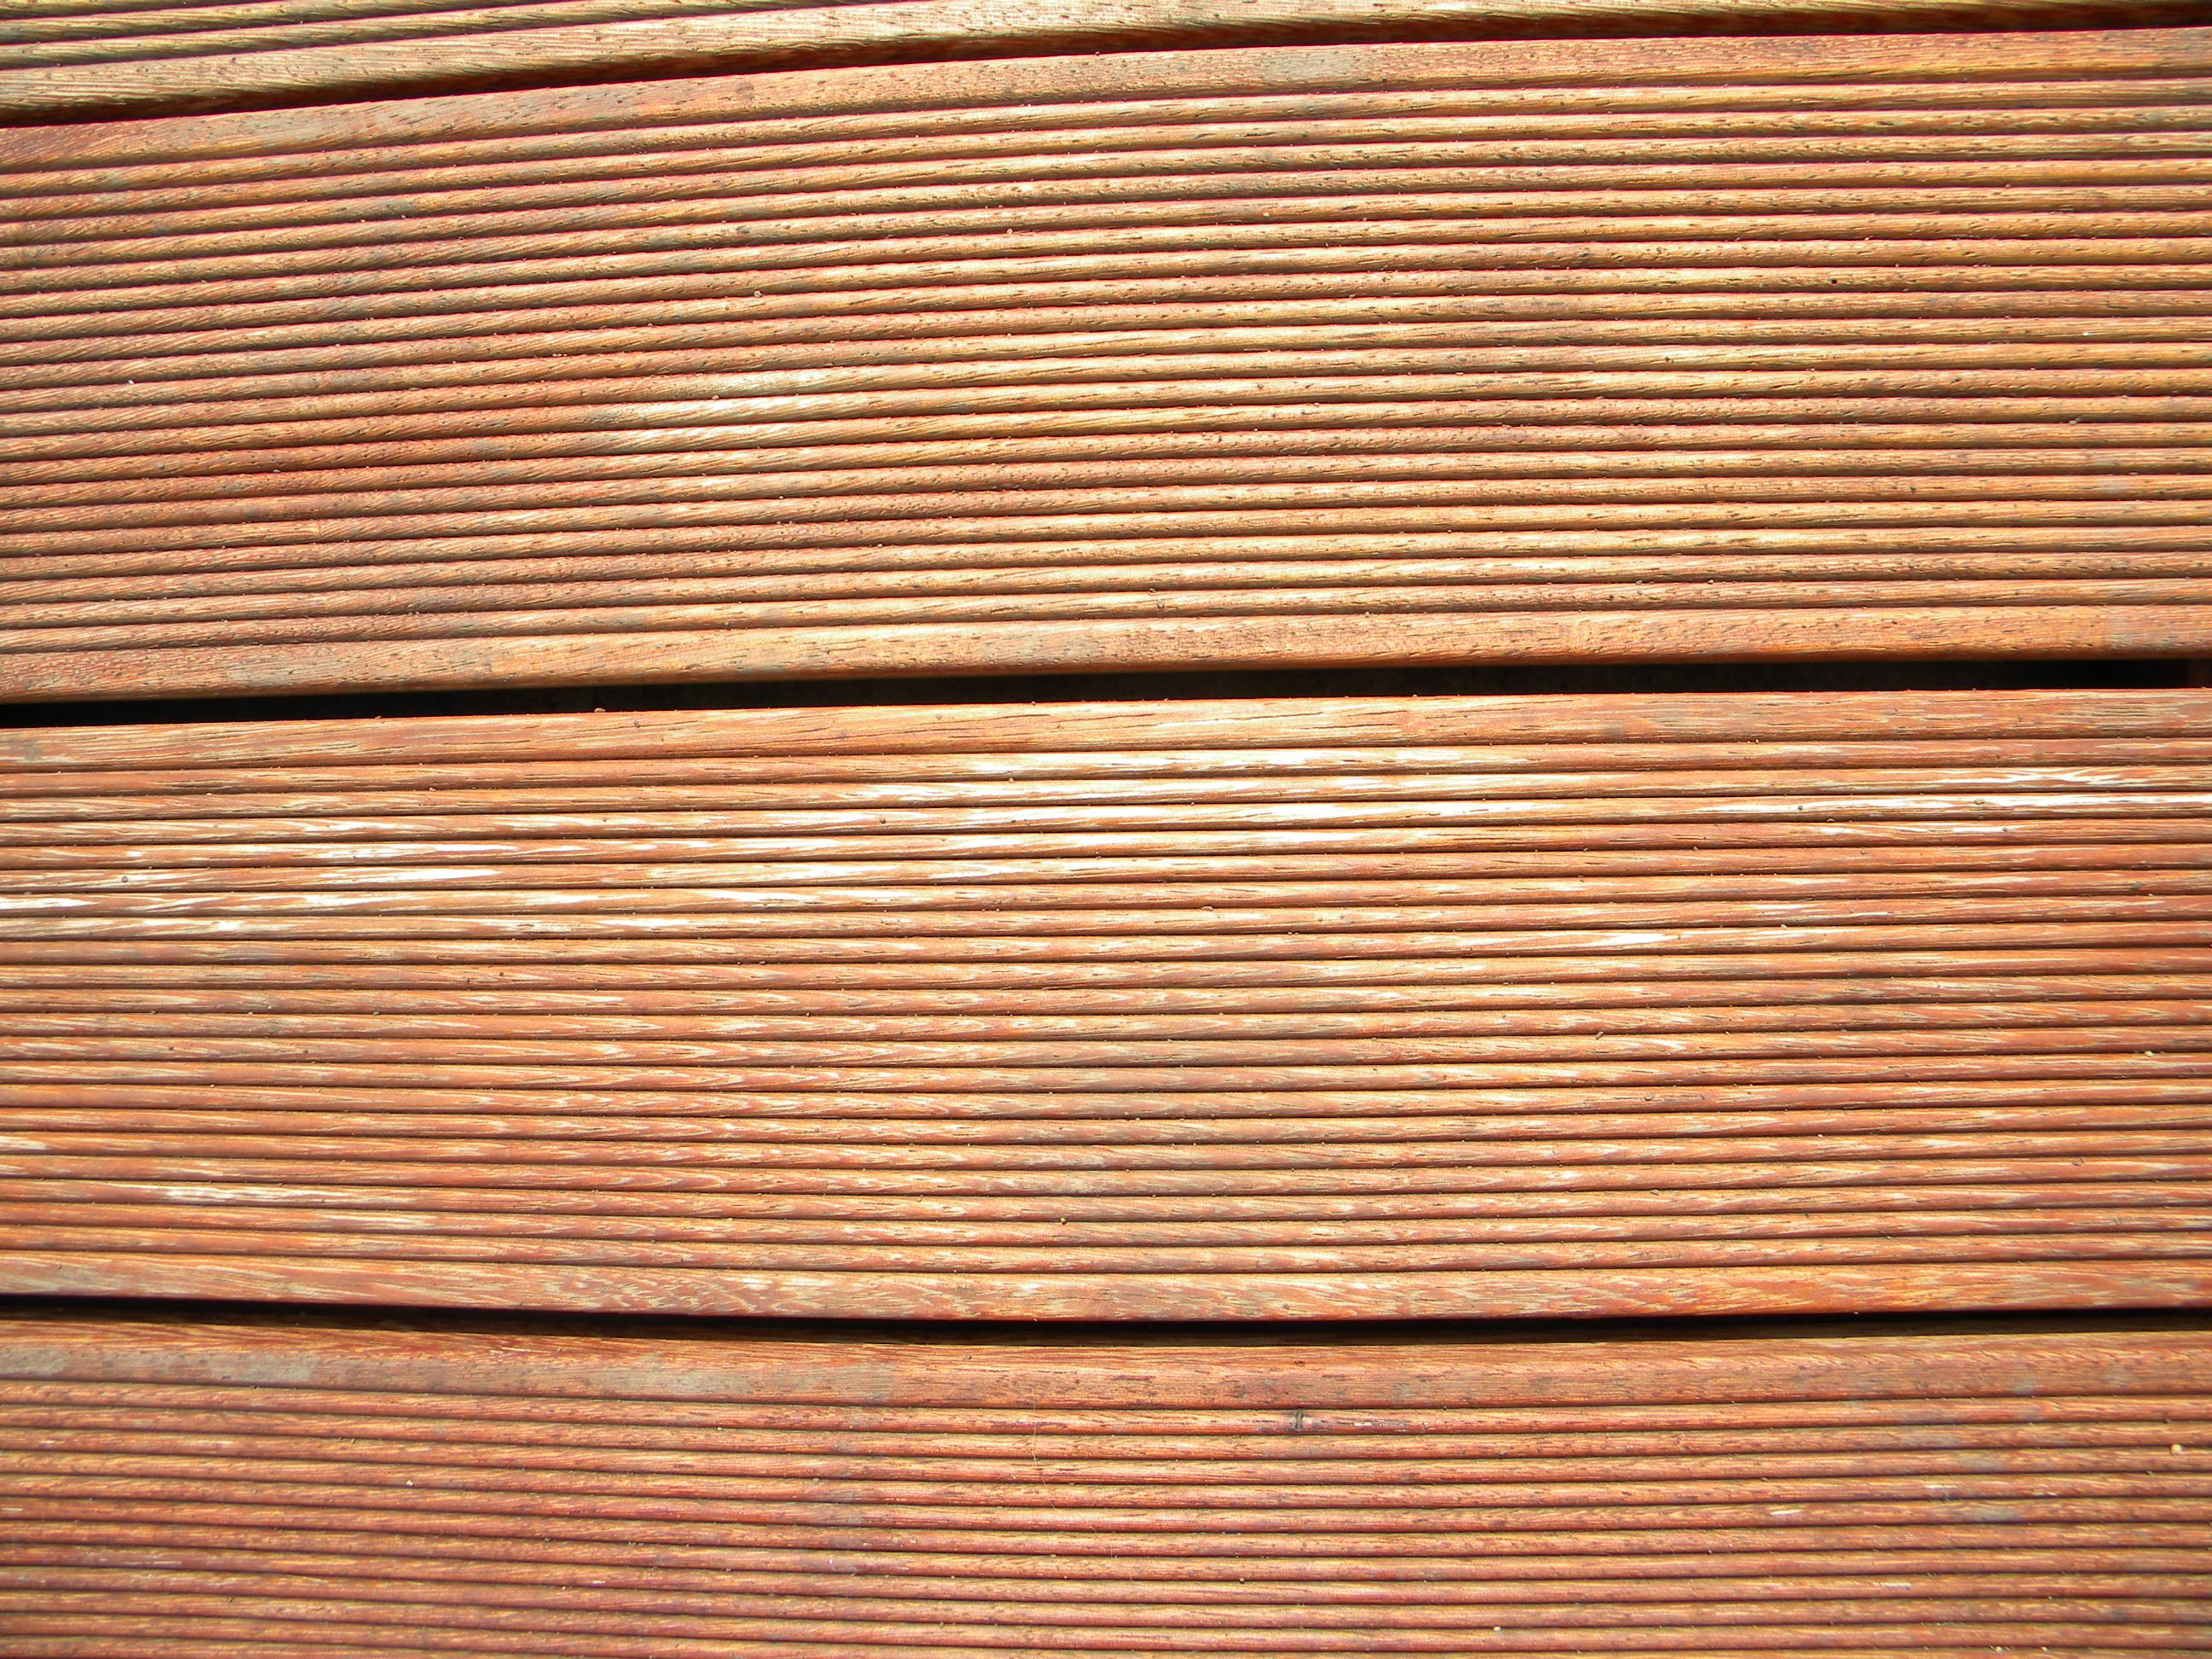 Deck-uri lemn - Angelim Pedra SELVA FLOORS - Poza 92